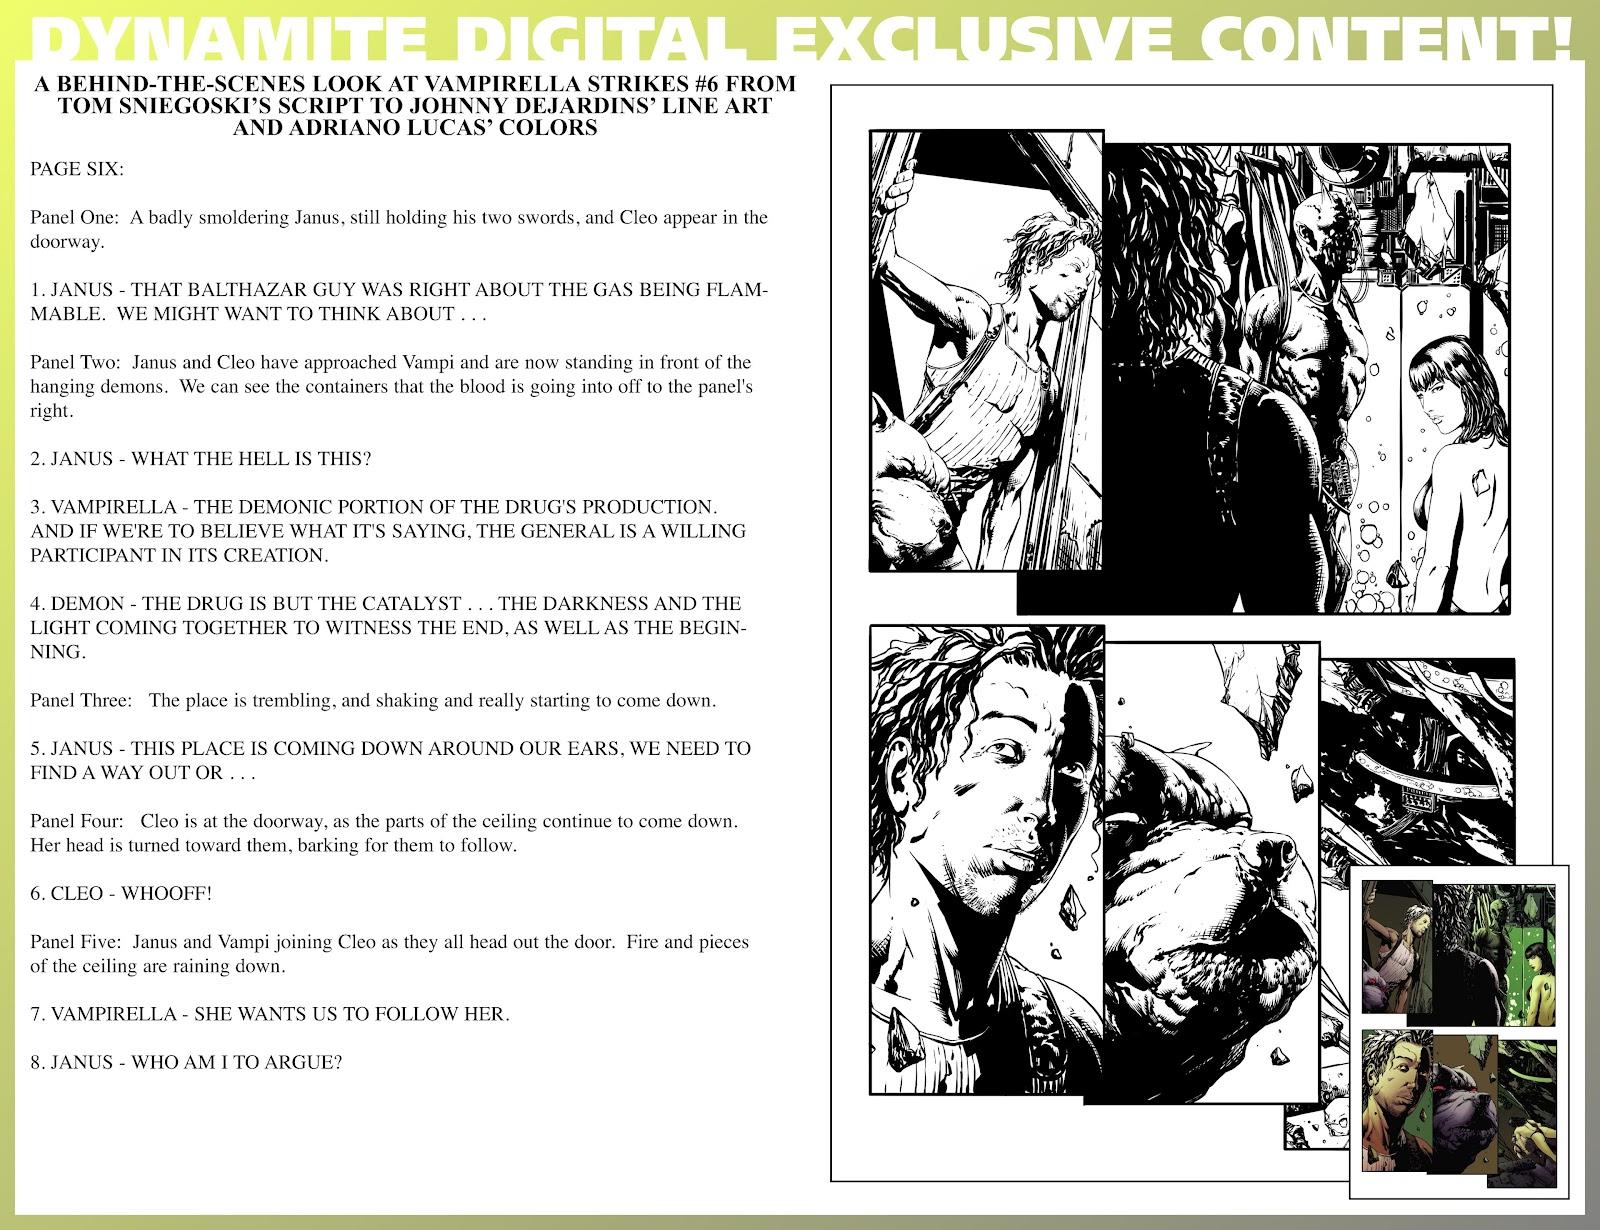 Read online Vampirella Strikes comic -  Issue #6 - 40